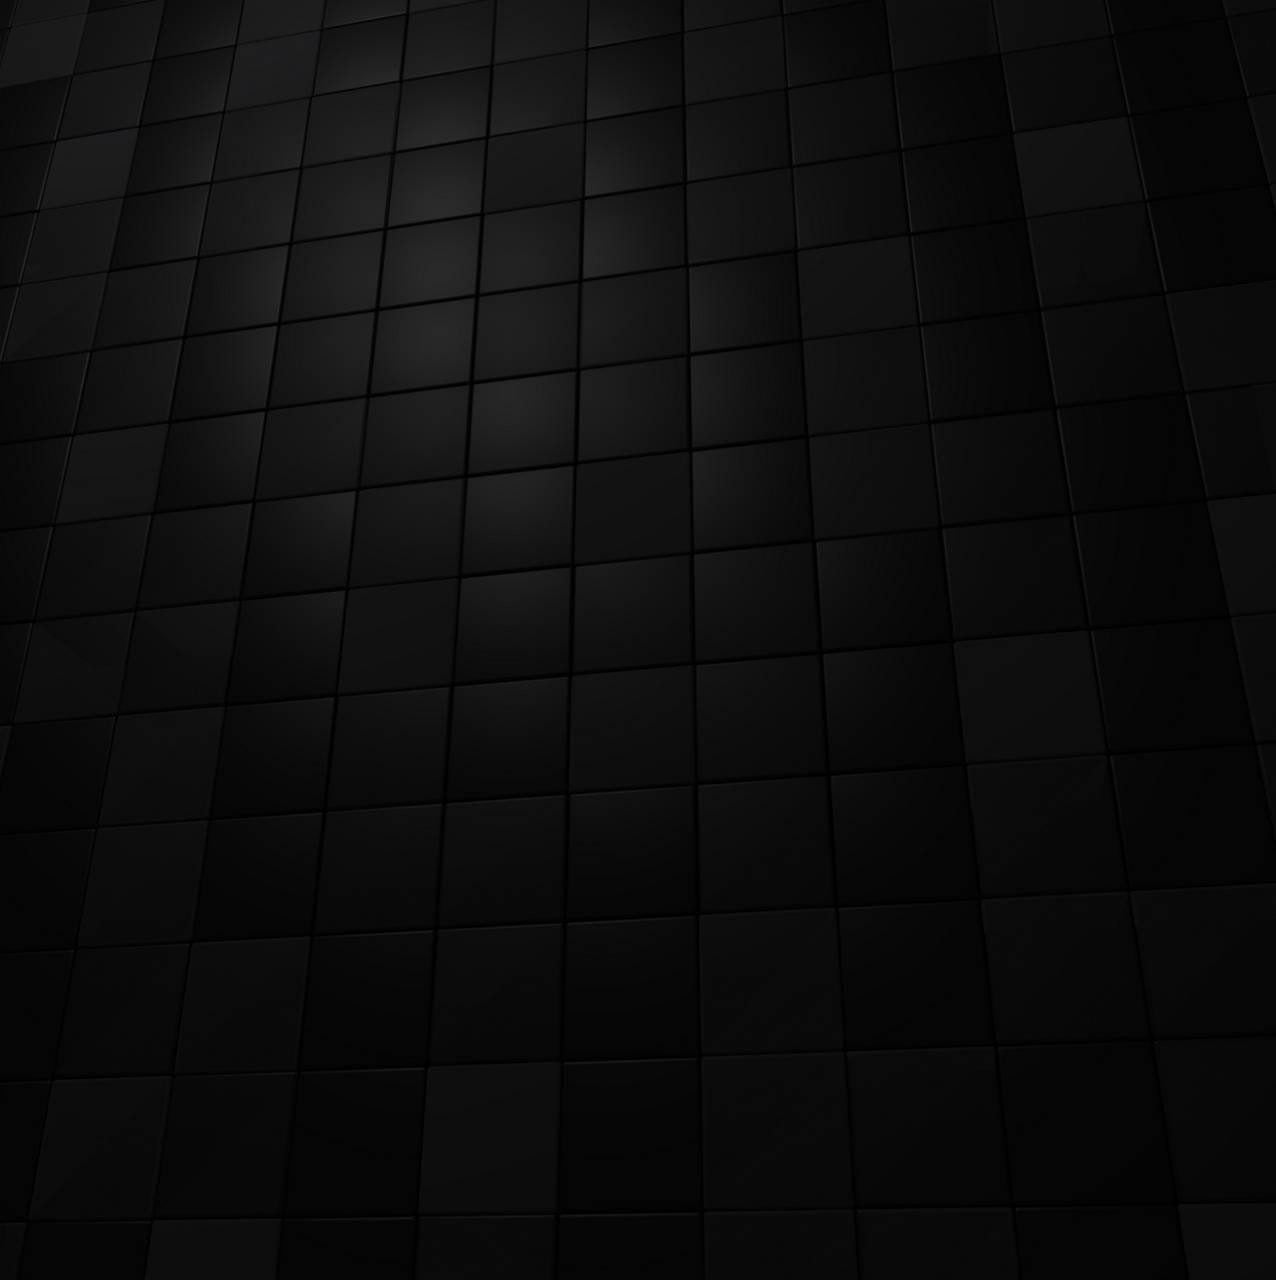 Black Cube Wall